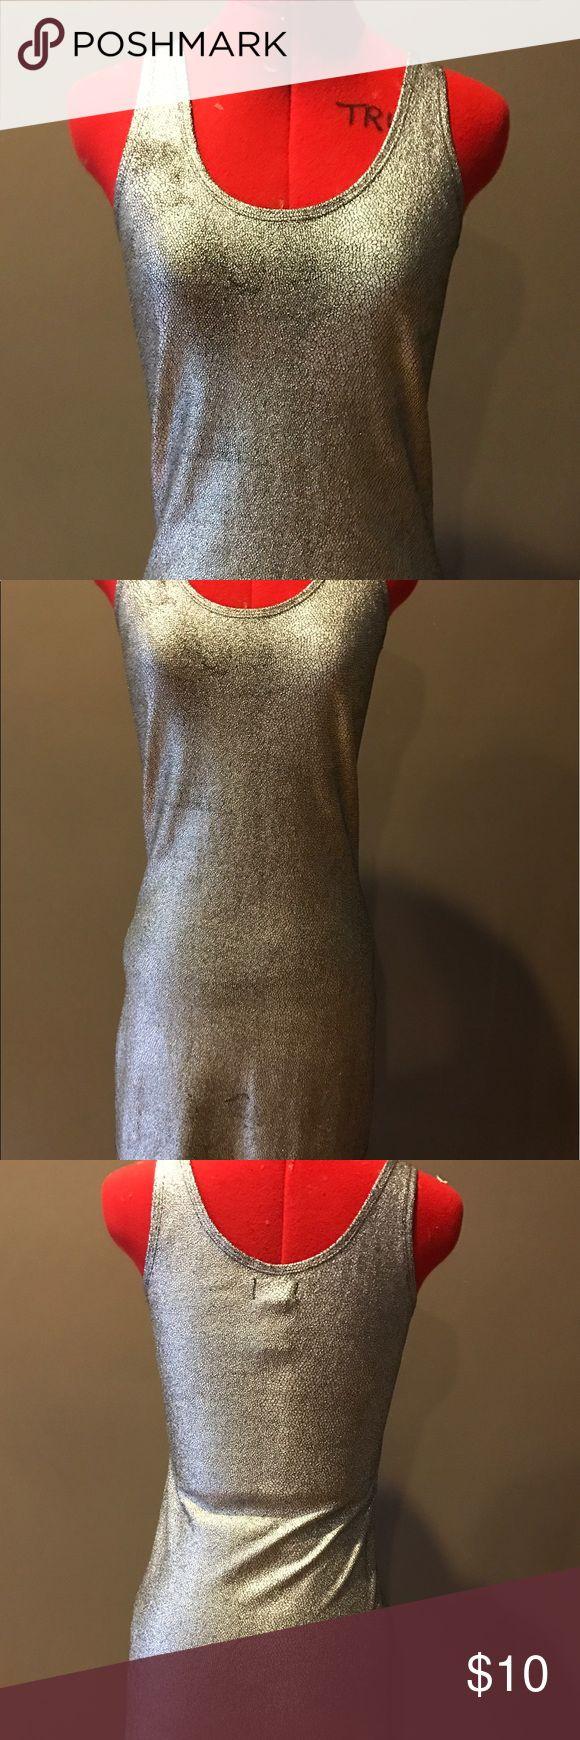 Silver Mini Dress Silver Mini Dress Wet Seal Dresses Mini